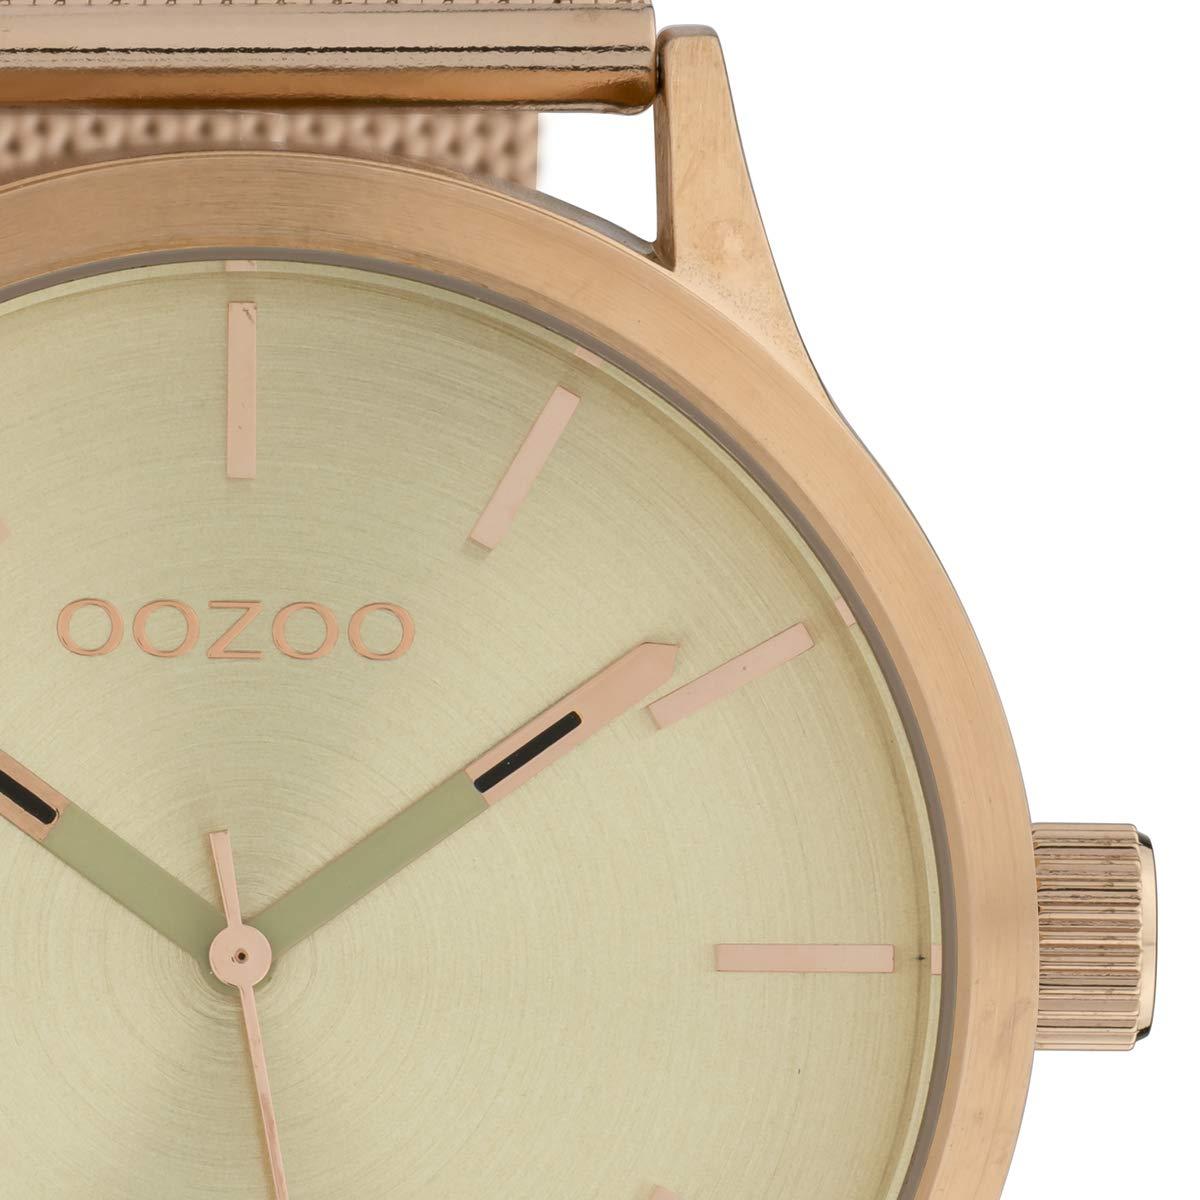 Oozoo herrklocka med rostfritt stål Milanaise metallband i 45 mm Beige/Rose